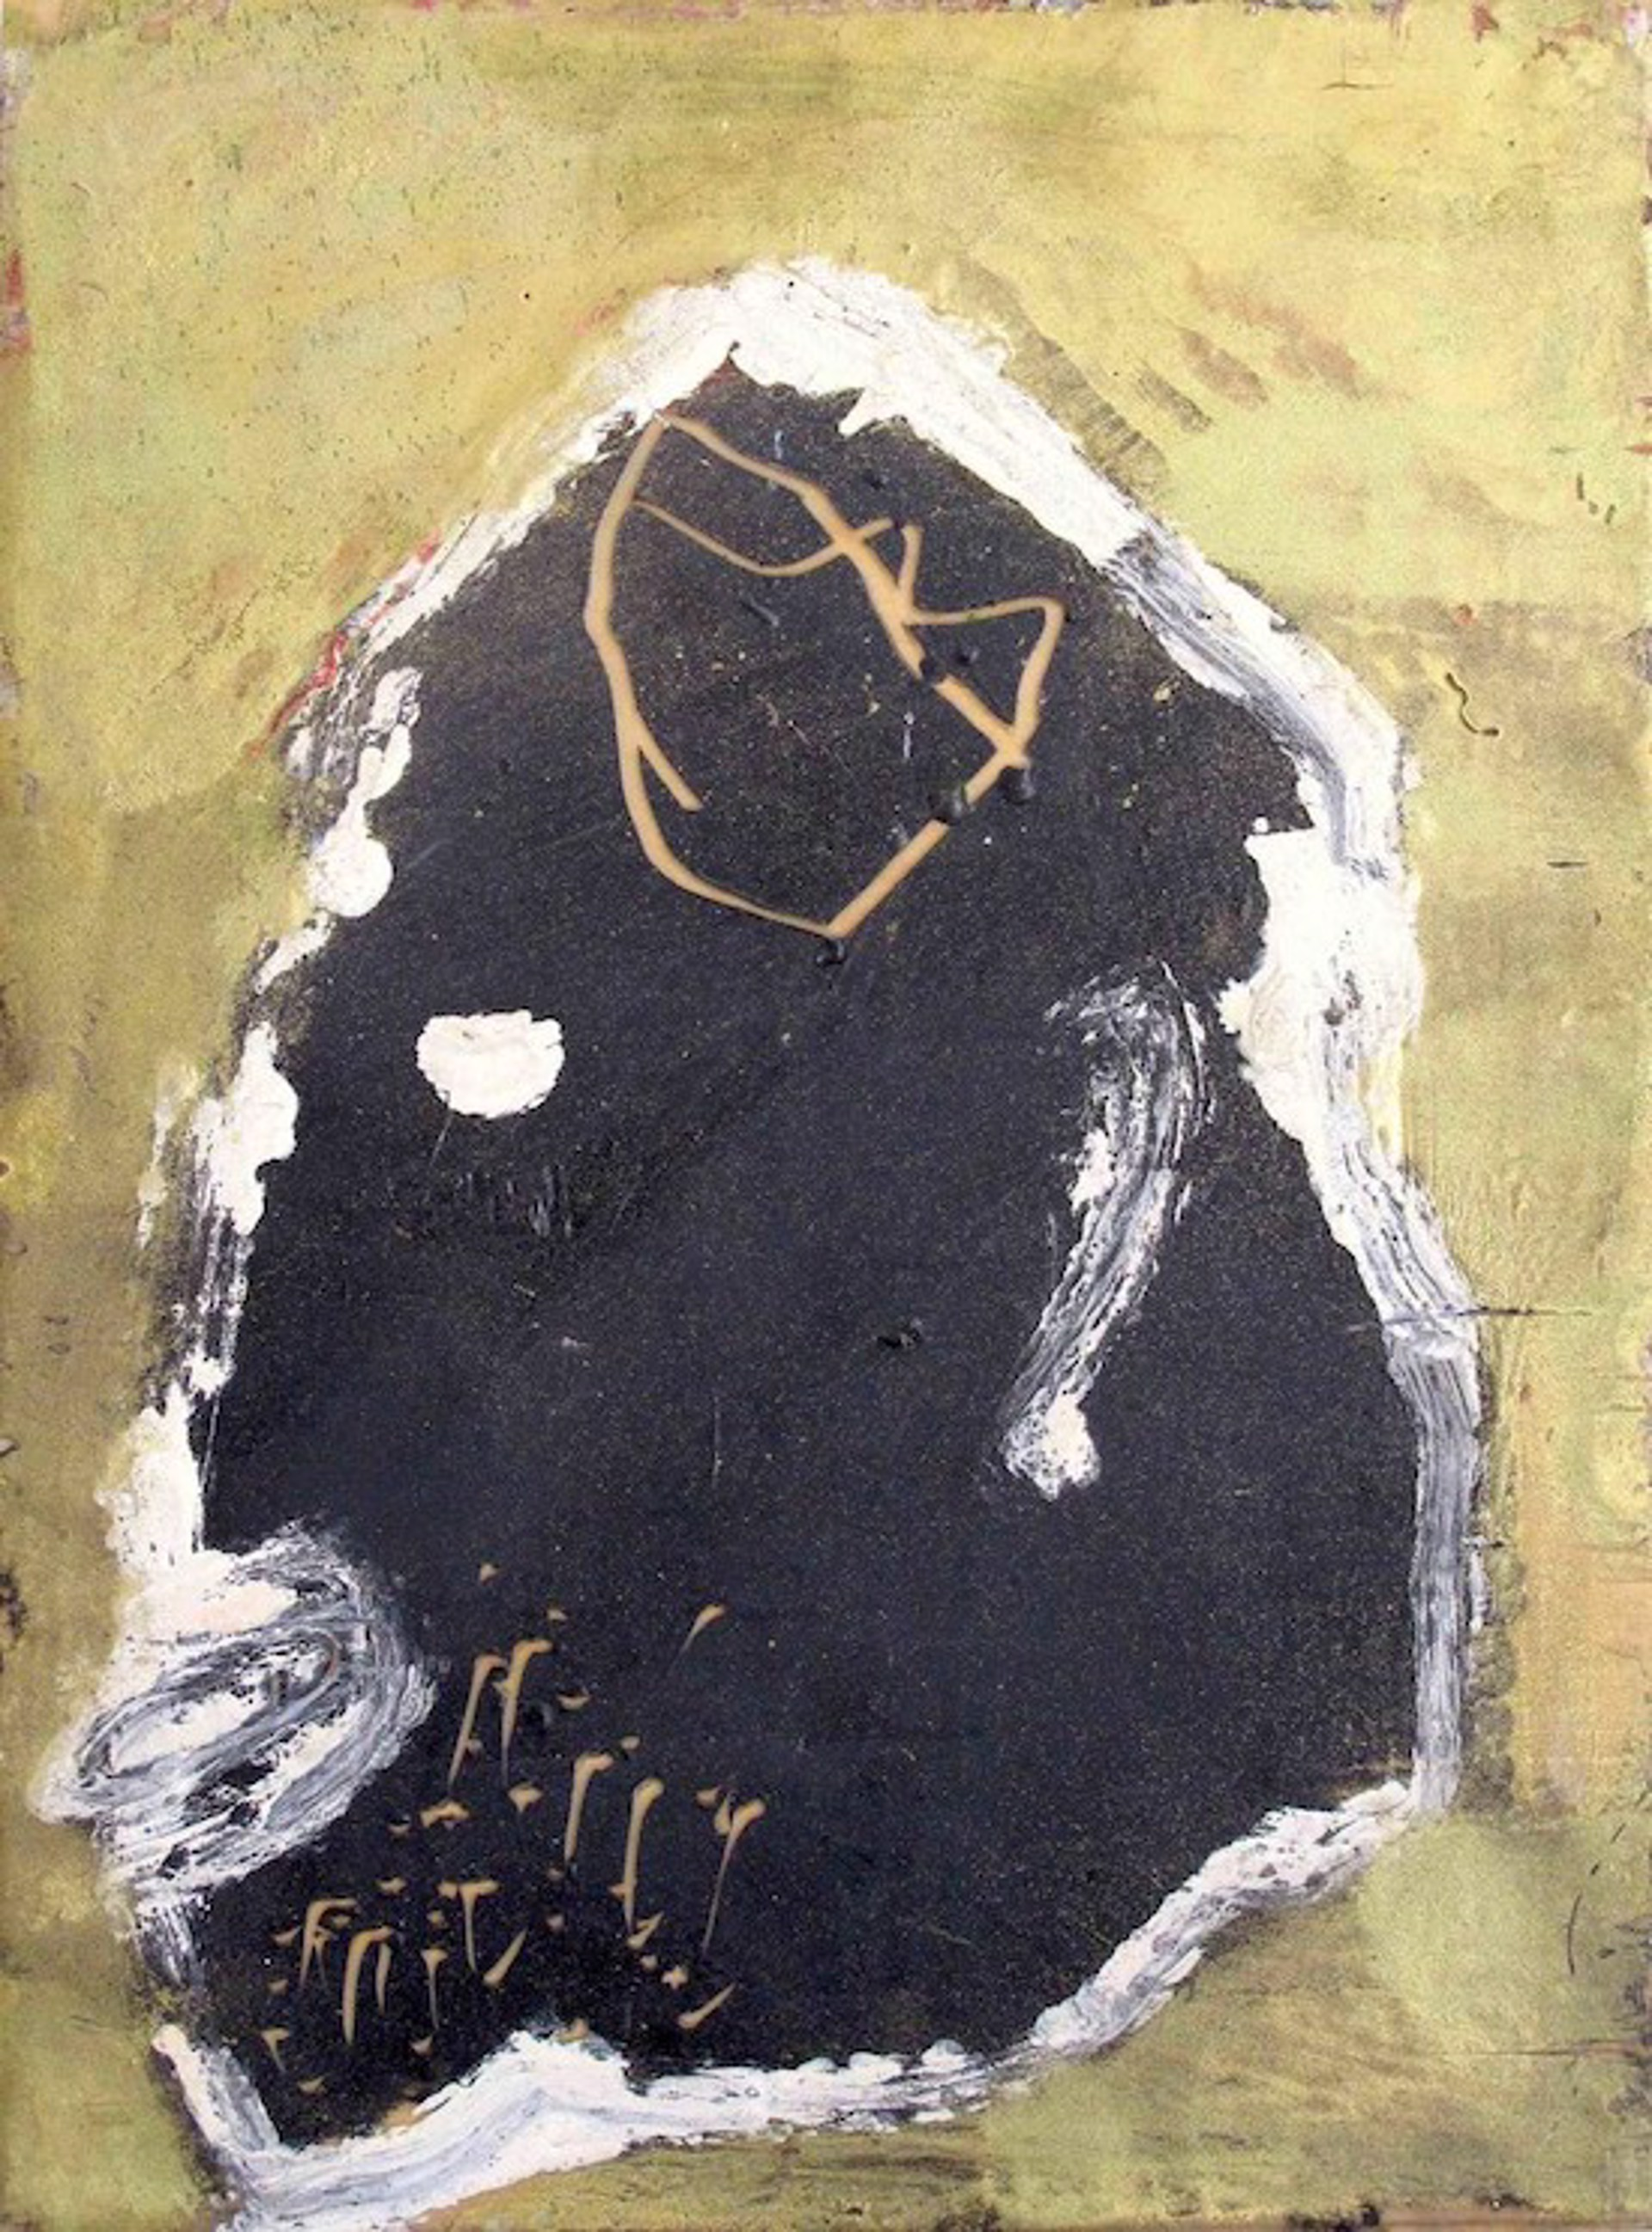 Portrait in Black on Gold by James Havard